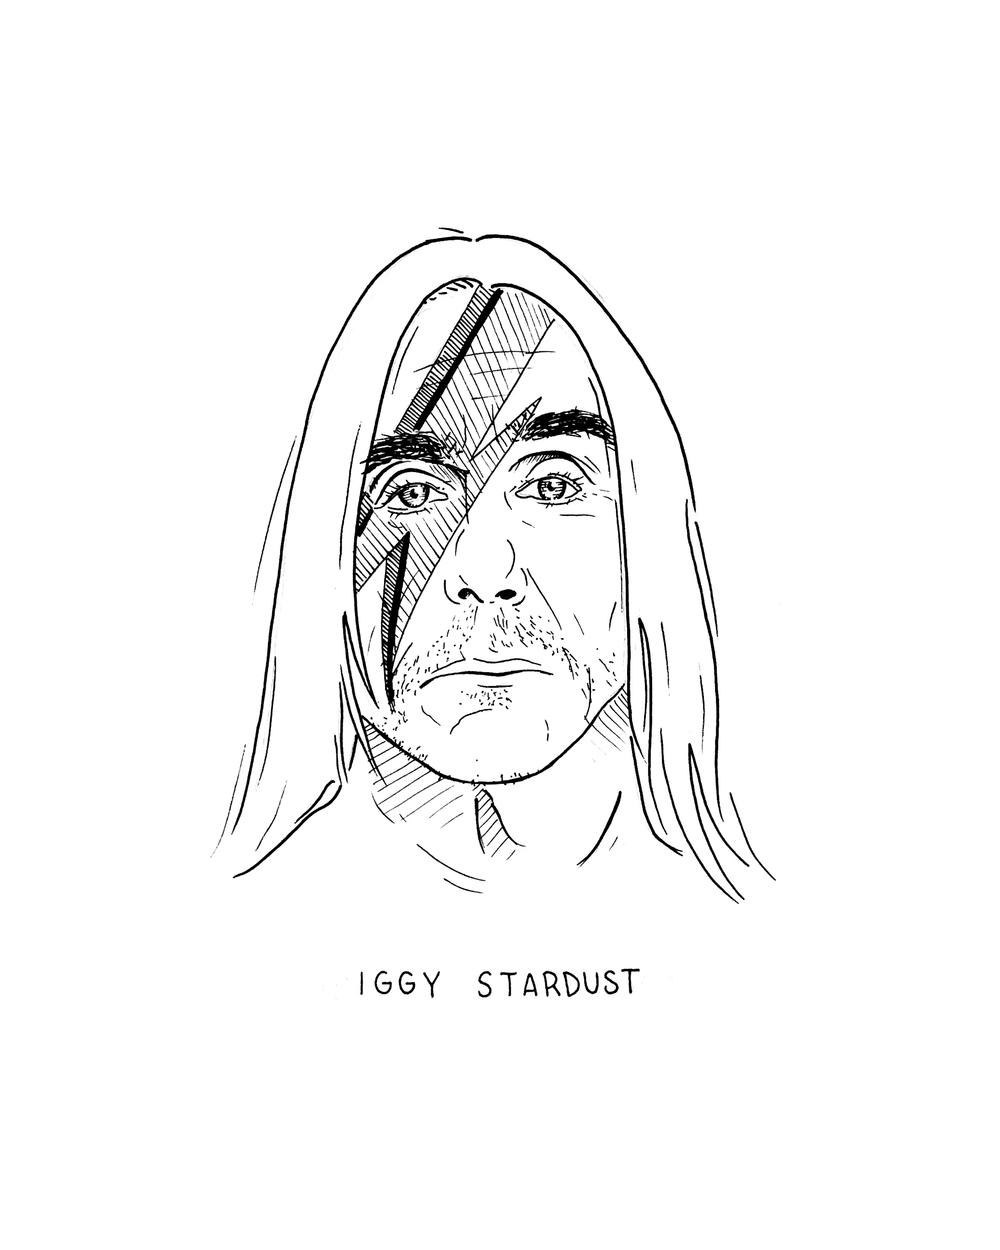 Iggy_Stardust.jpg